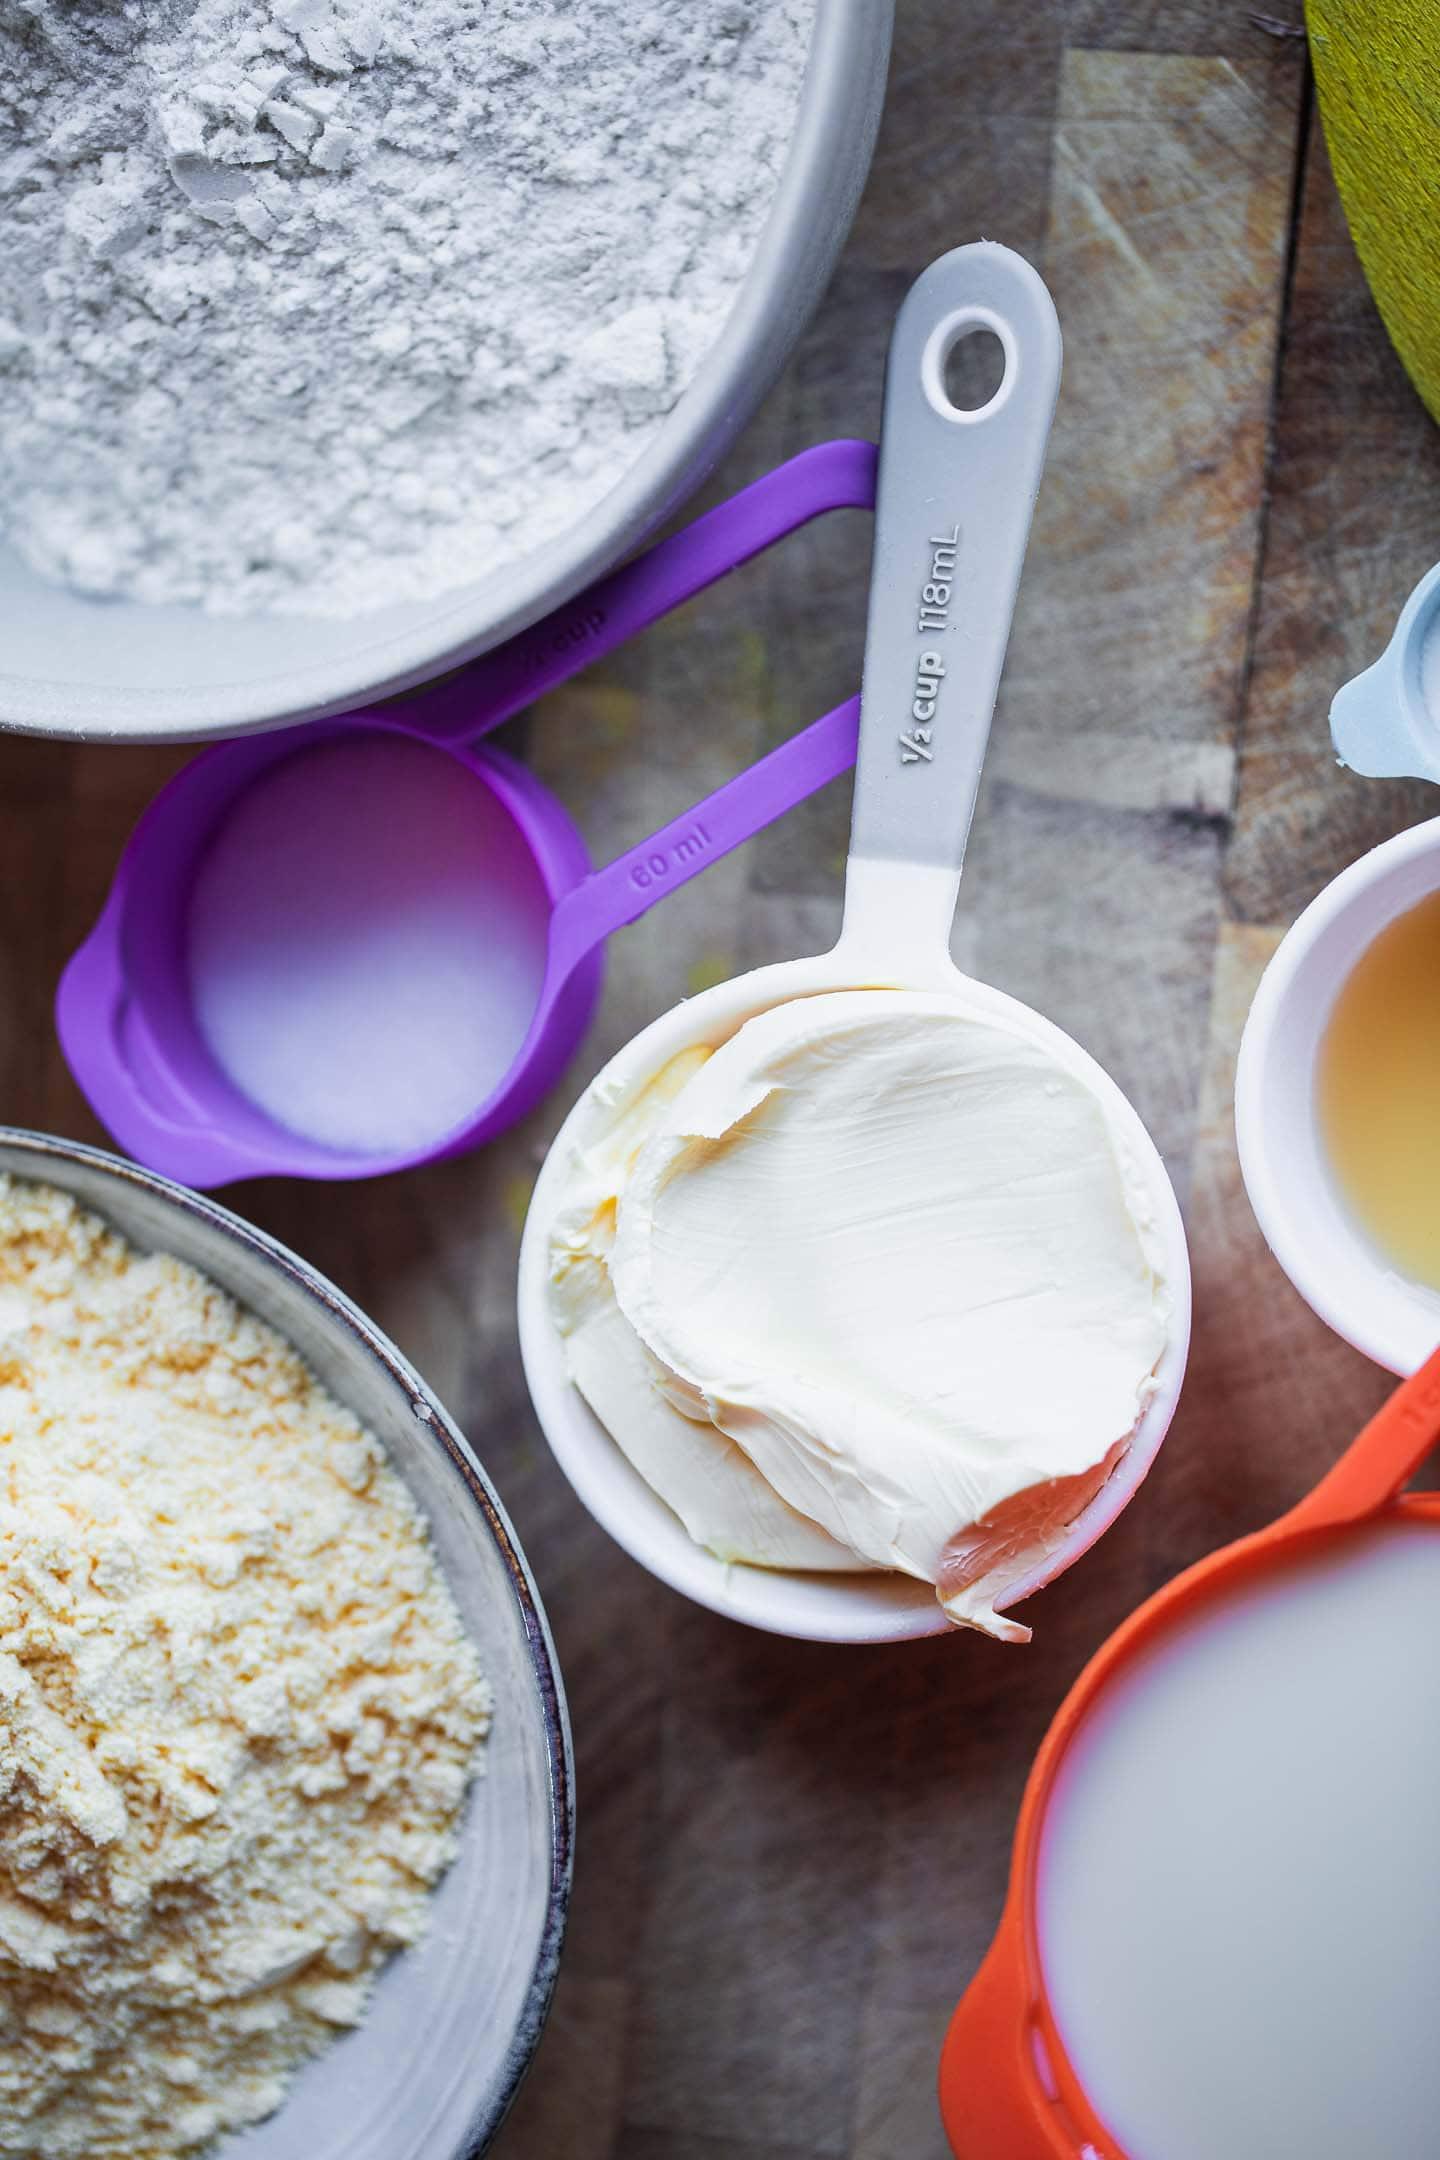 Ingredients for gluten-free vegan biscuits